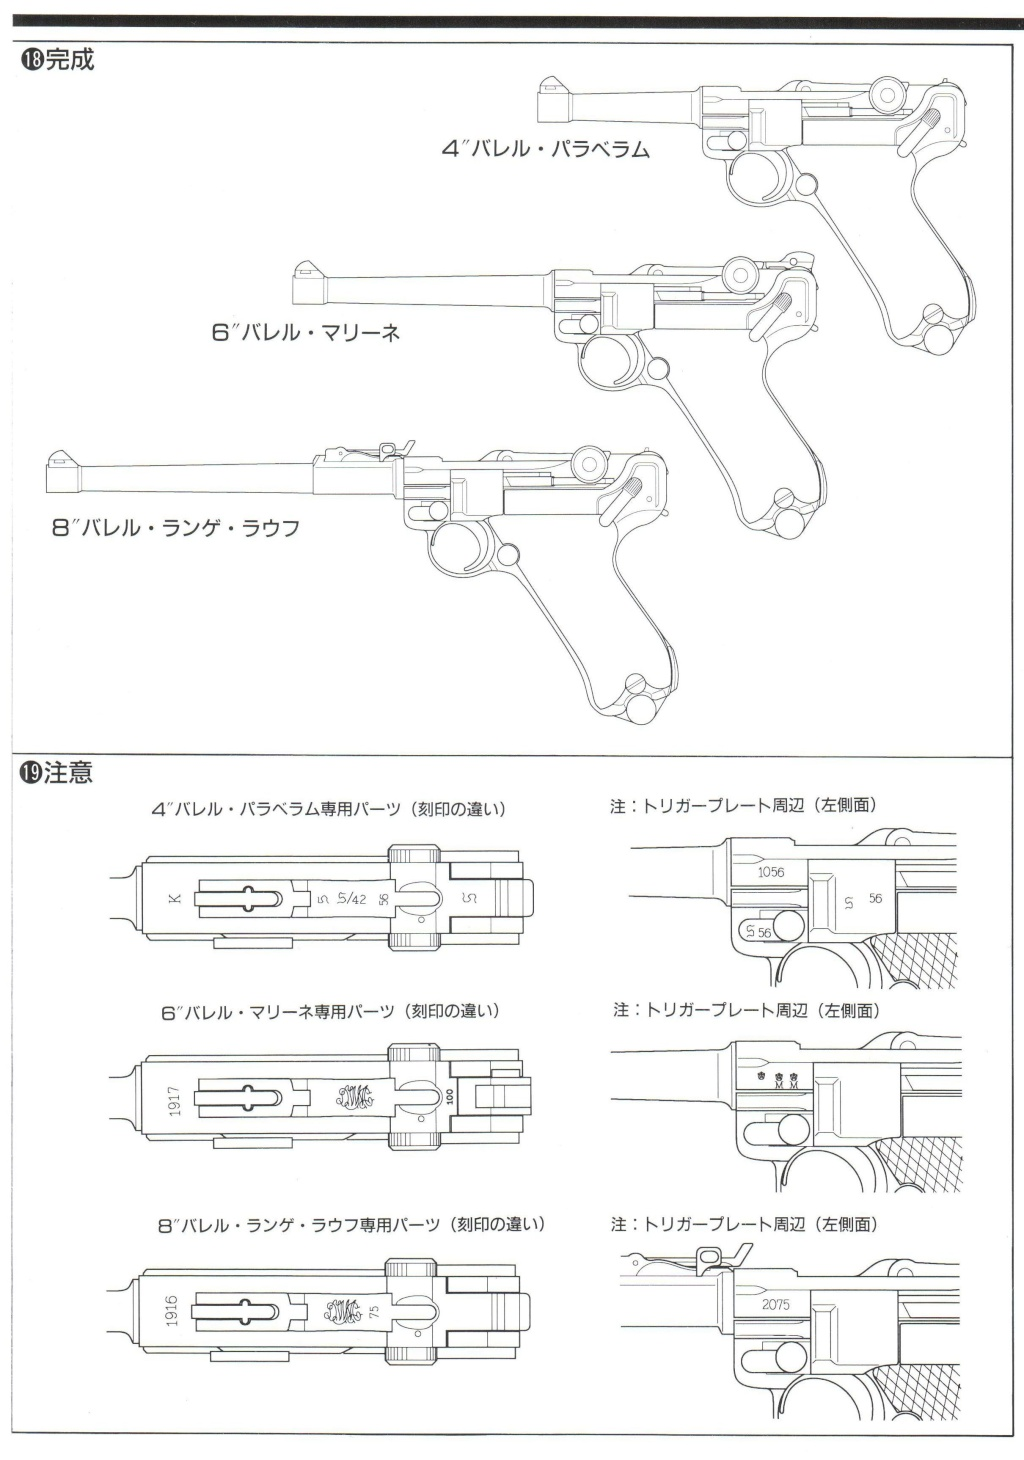 Marushin Metal KIT Dummy Cartridge Model LUGER P08 cal. 9 mm Instruction Manual F10